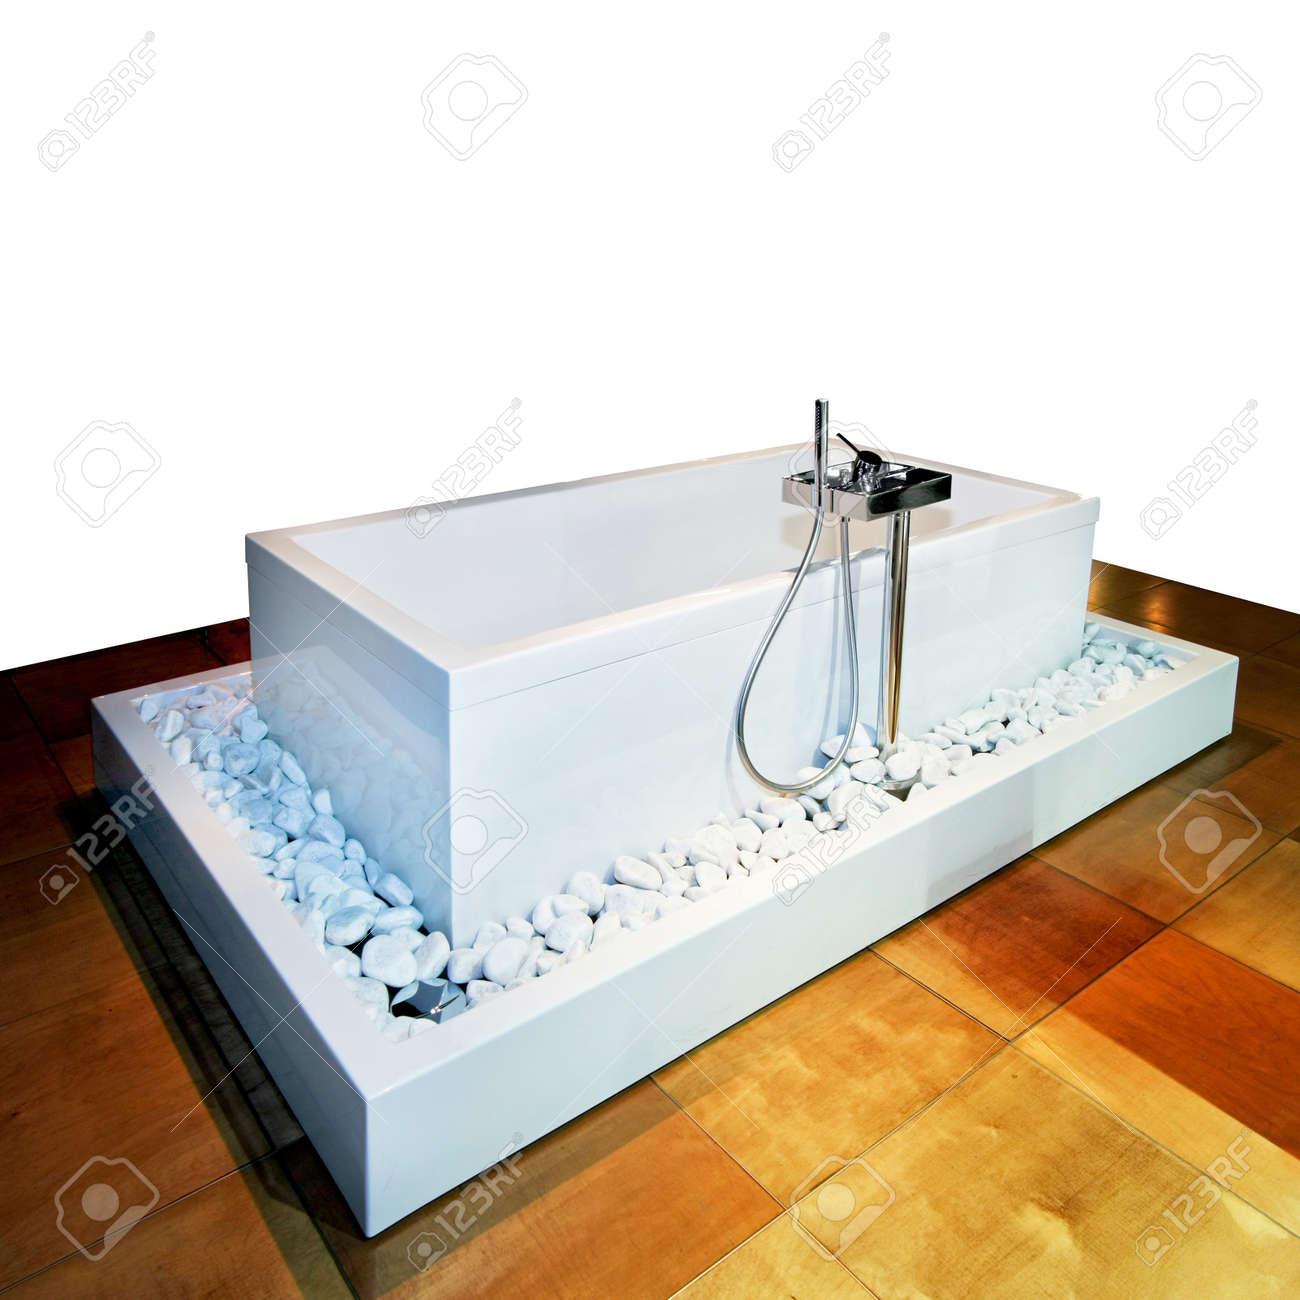 Rectangular Bathtub In Bathroom With Wooden Floor Stock Photo ...